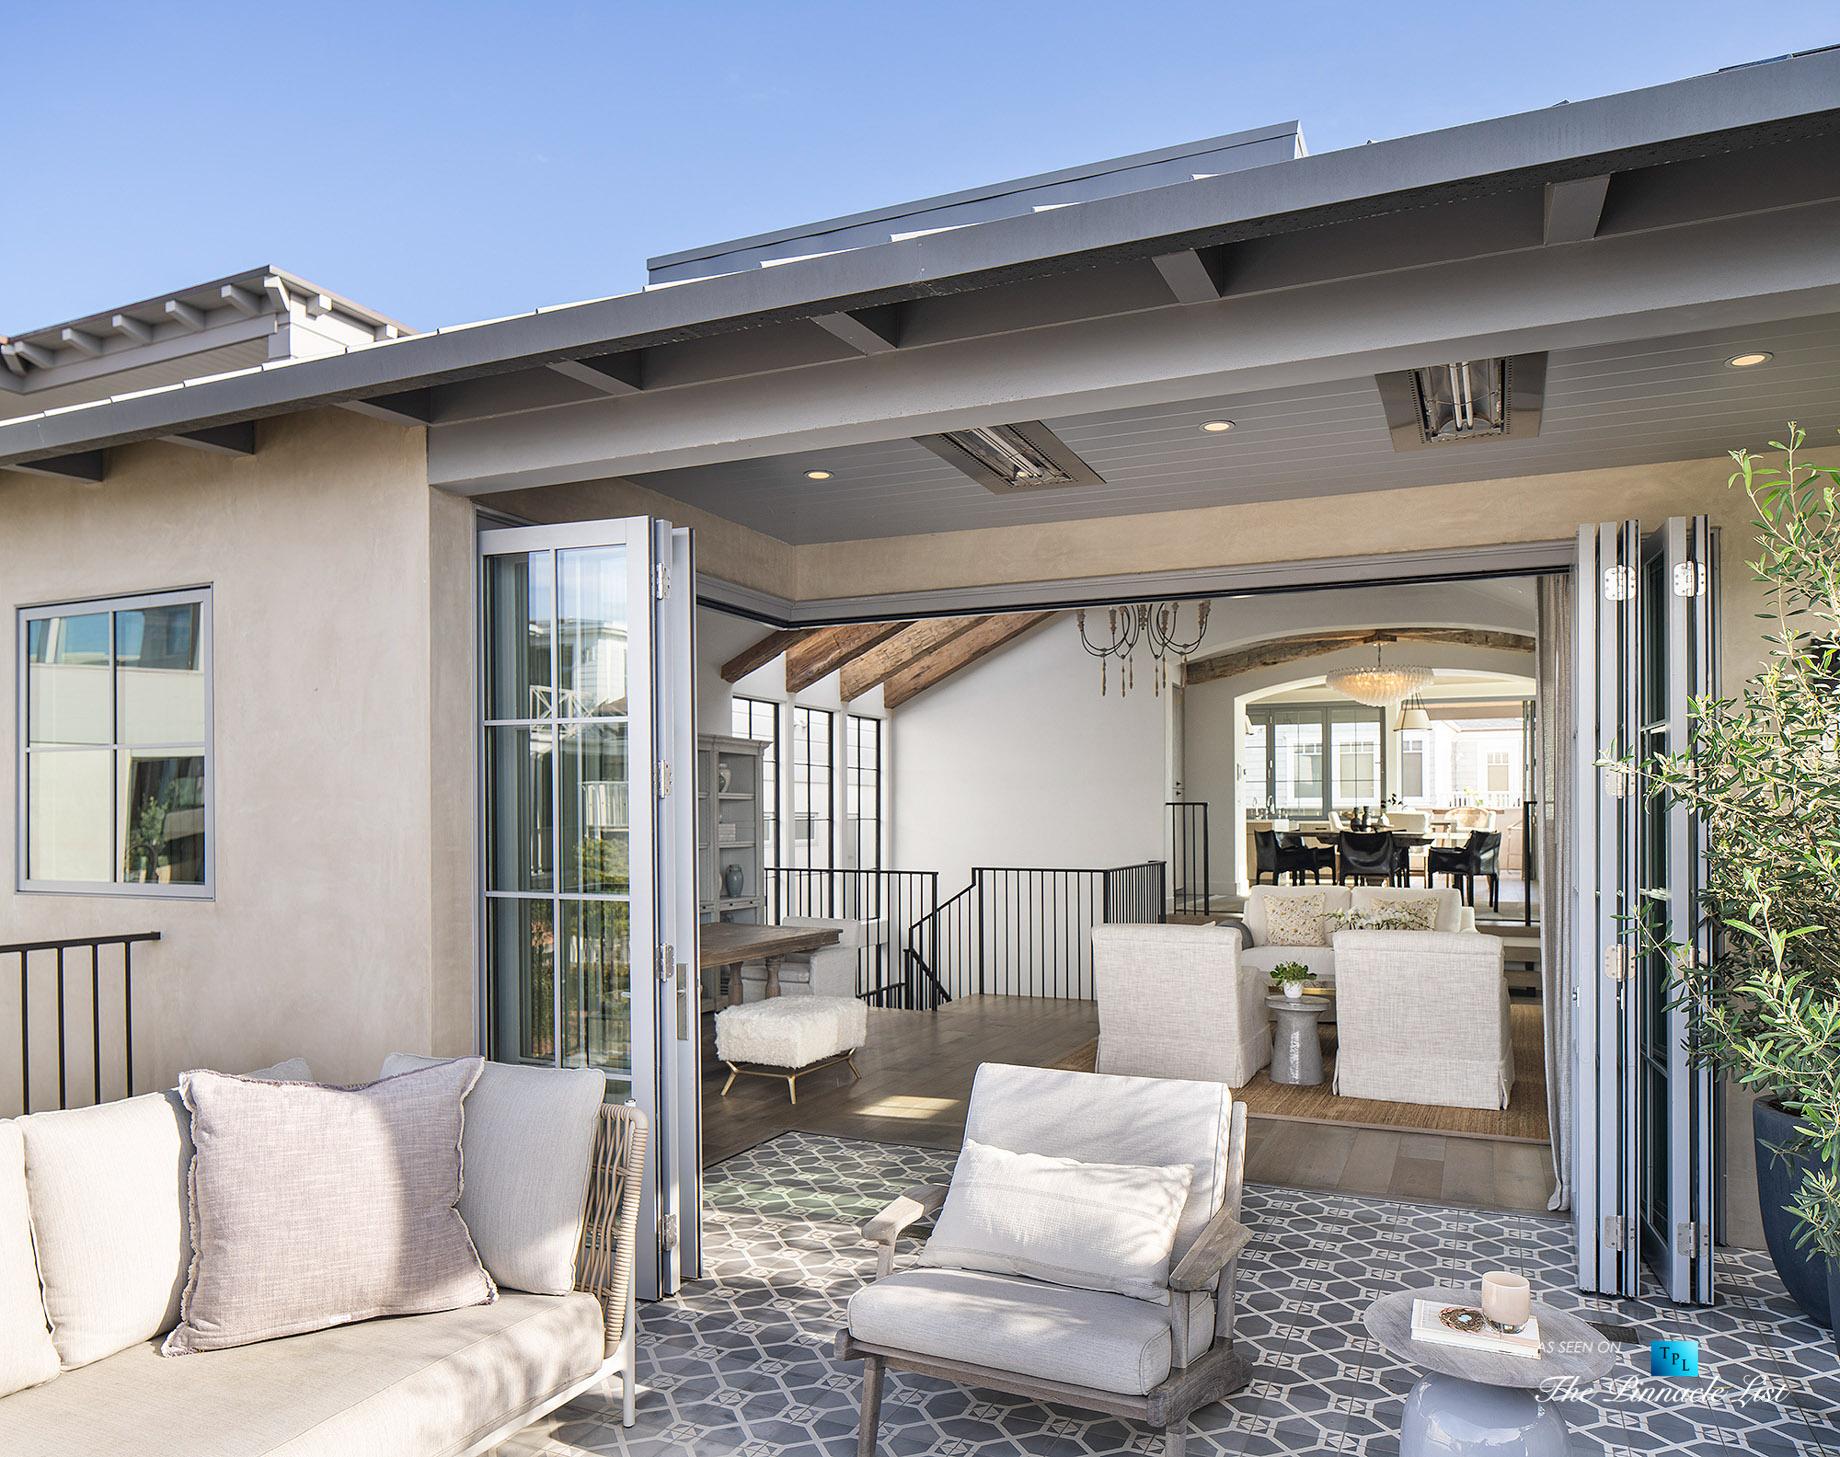 Exquisite Luxury Walk Street Home – 220 8th St, Manhattan Beach, CA, USA – Private Outdoor Deck